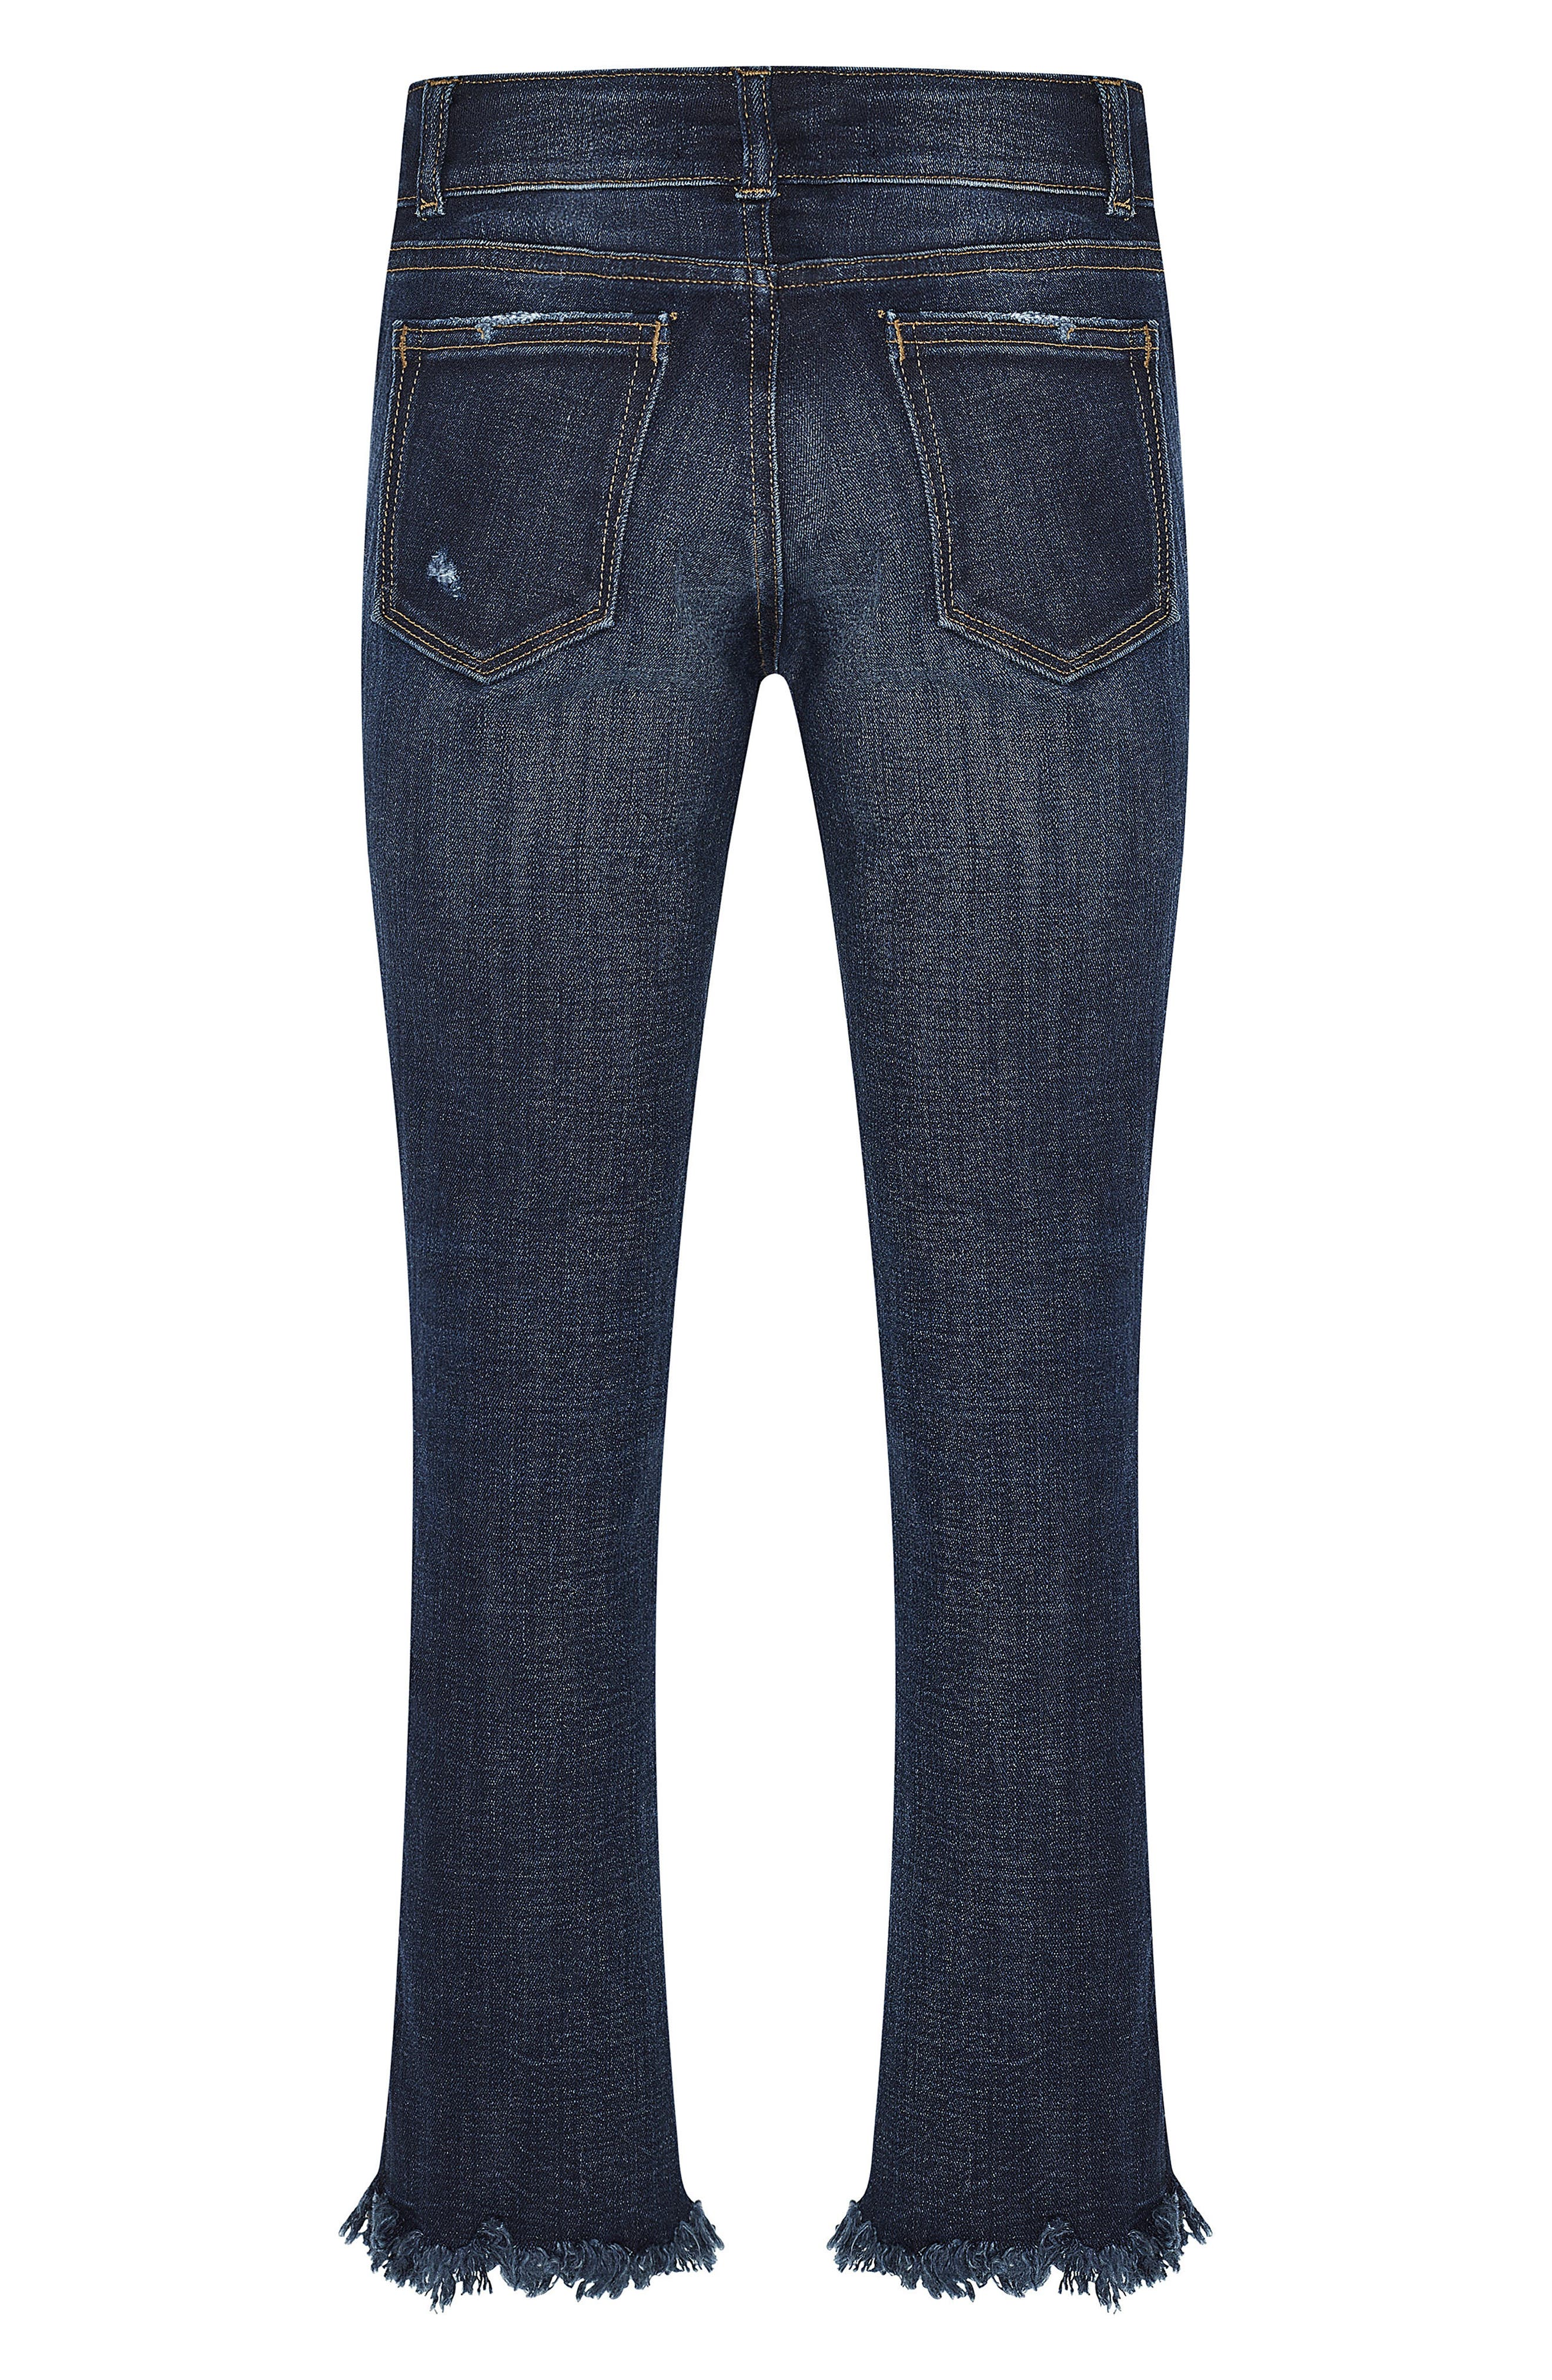 Alternate Image 2  - DL1916 Chloe Distressed Skinny Jeans (Big Girls)